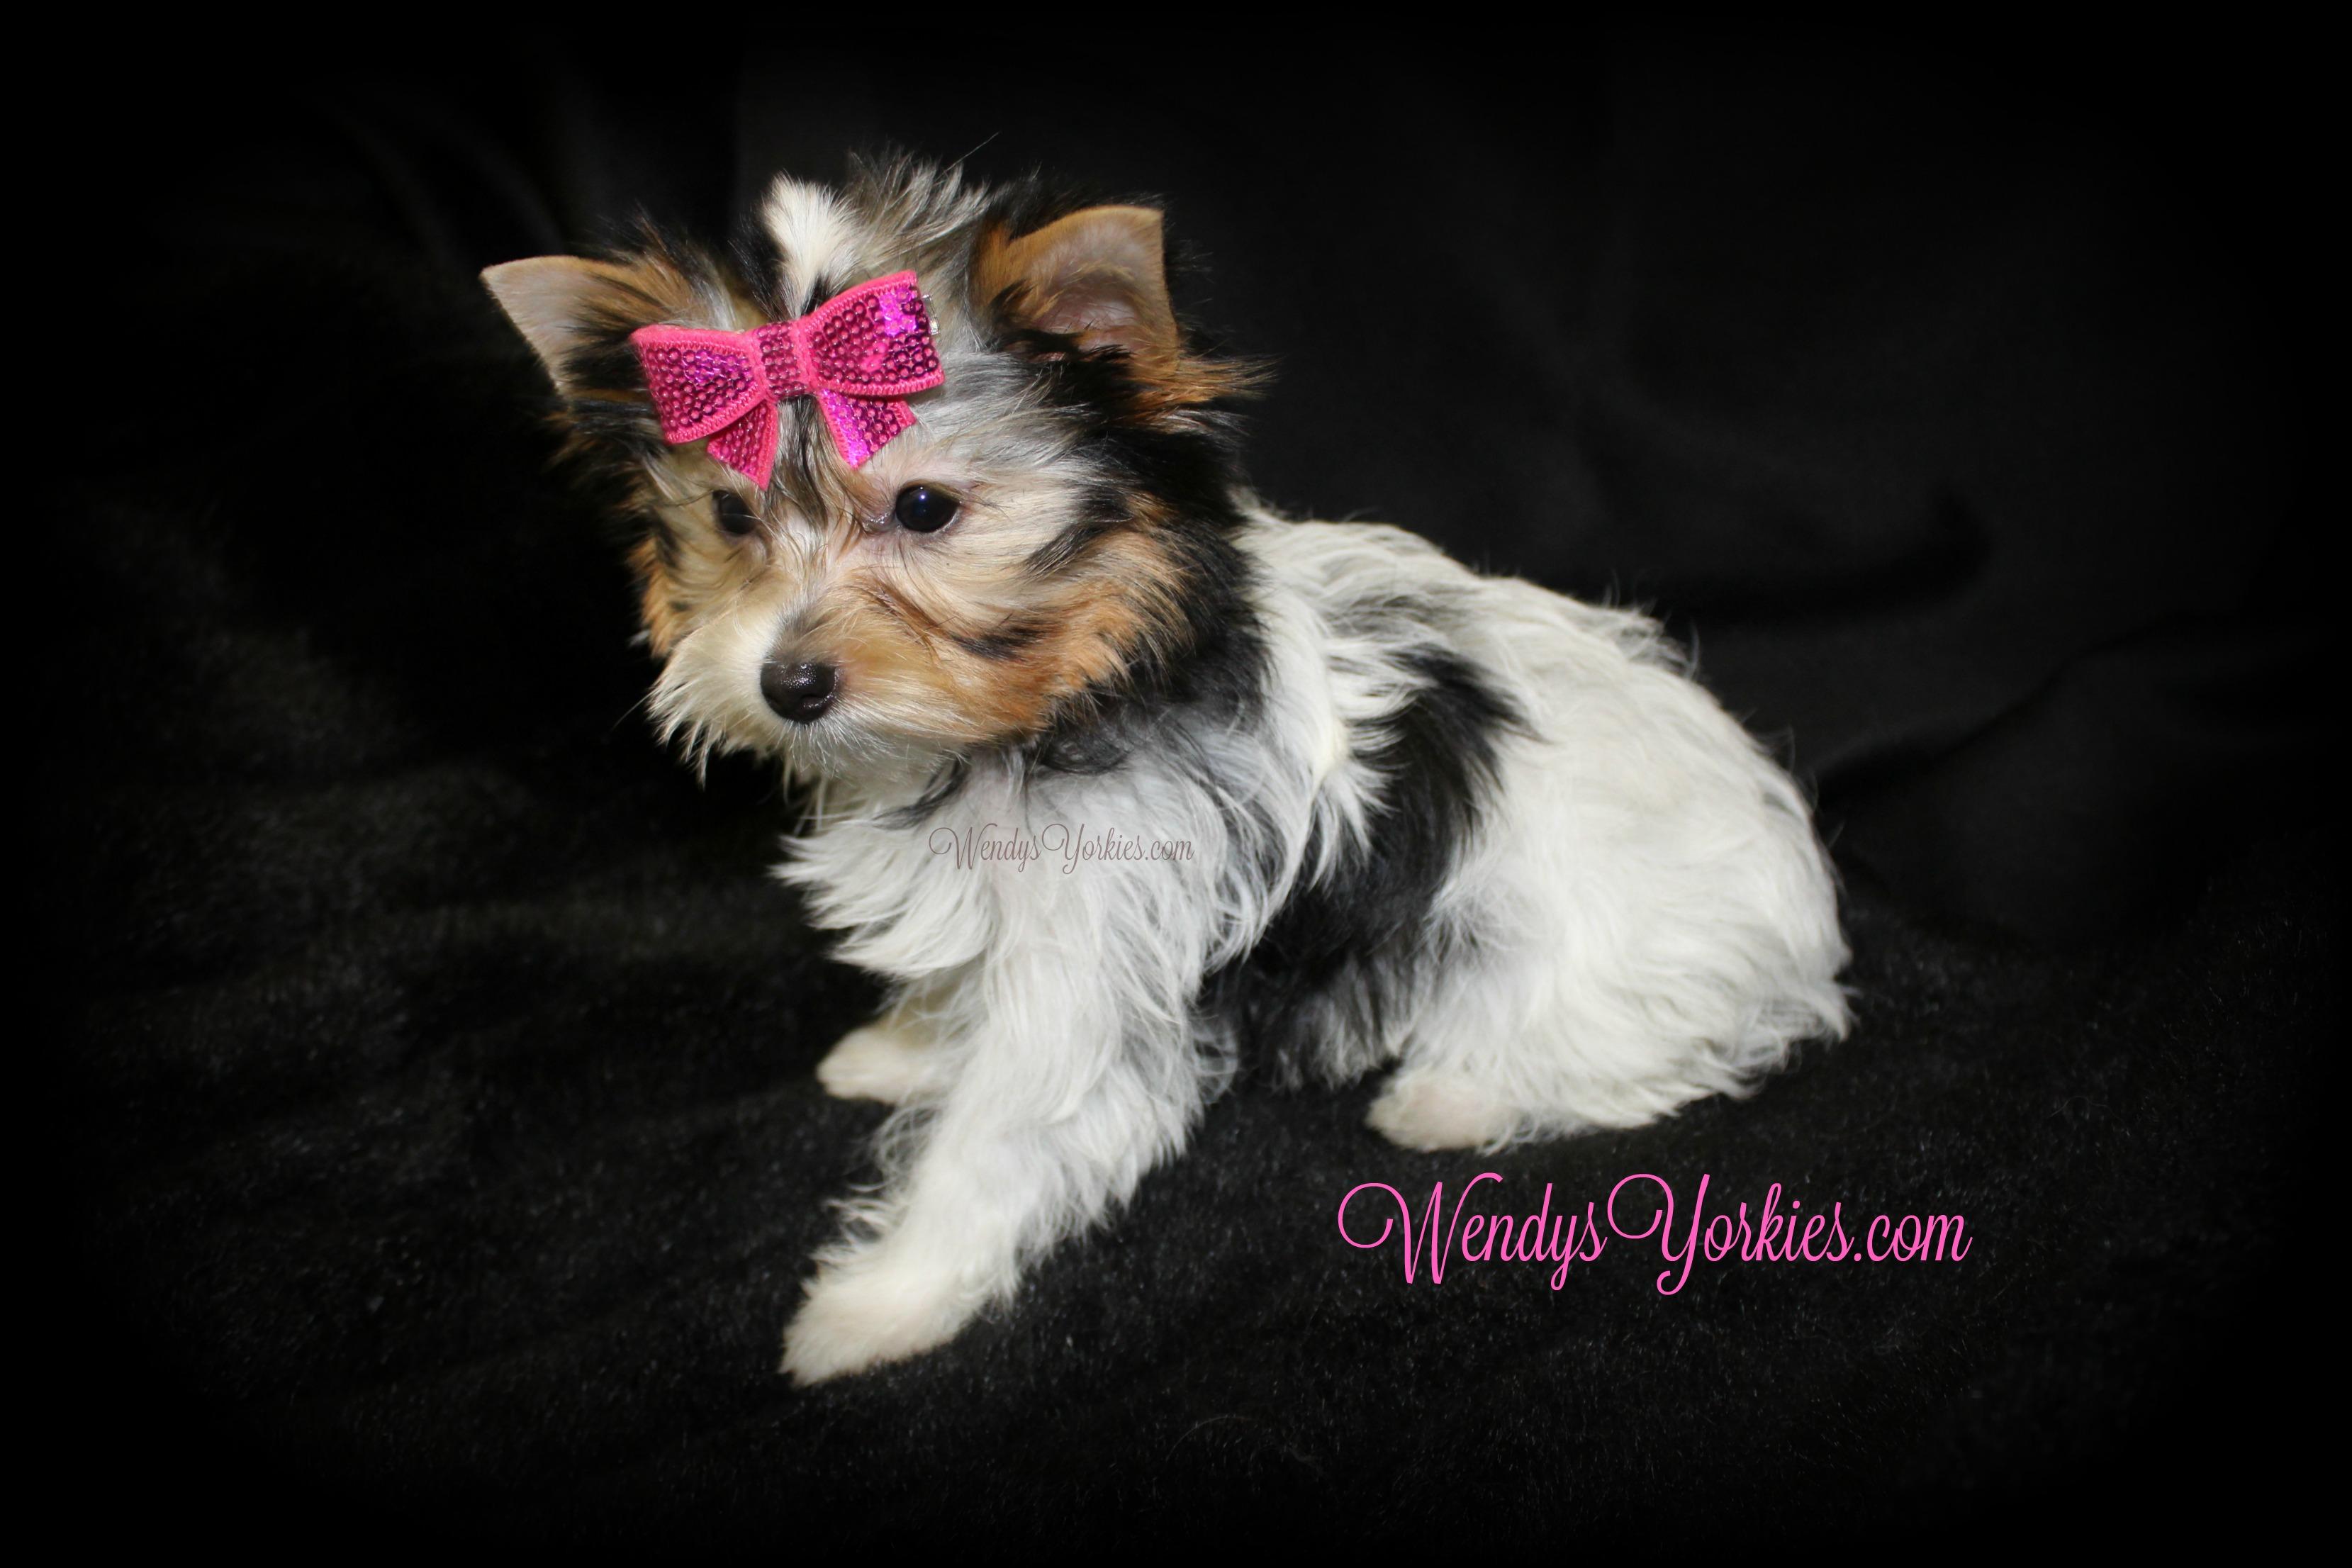 Tiny Teacup Parti Yorkie puppy, WendysYorkies.com, Daisy pf1